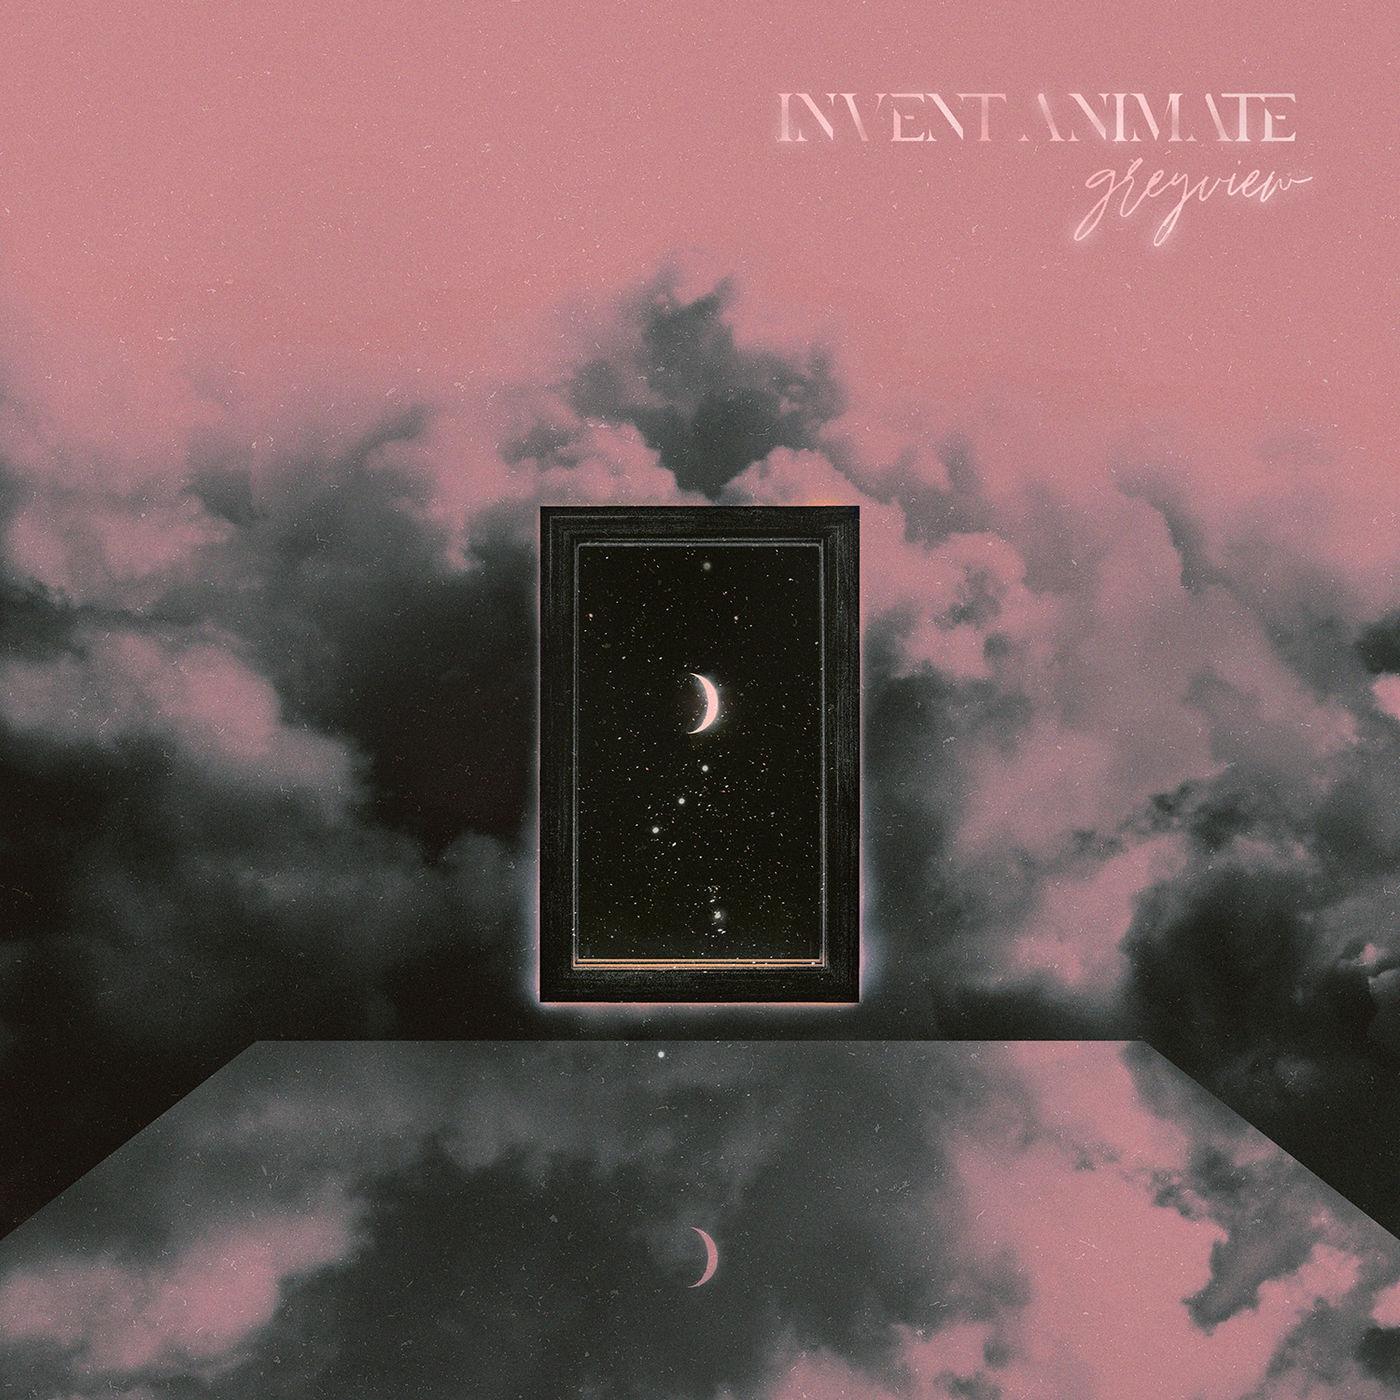 Invent, Animate - Halcyon [single] (2020)